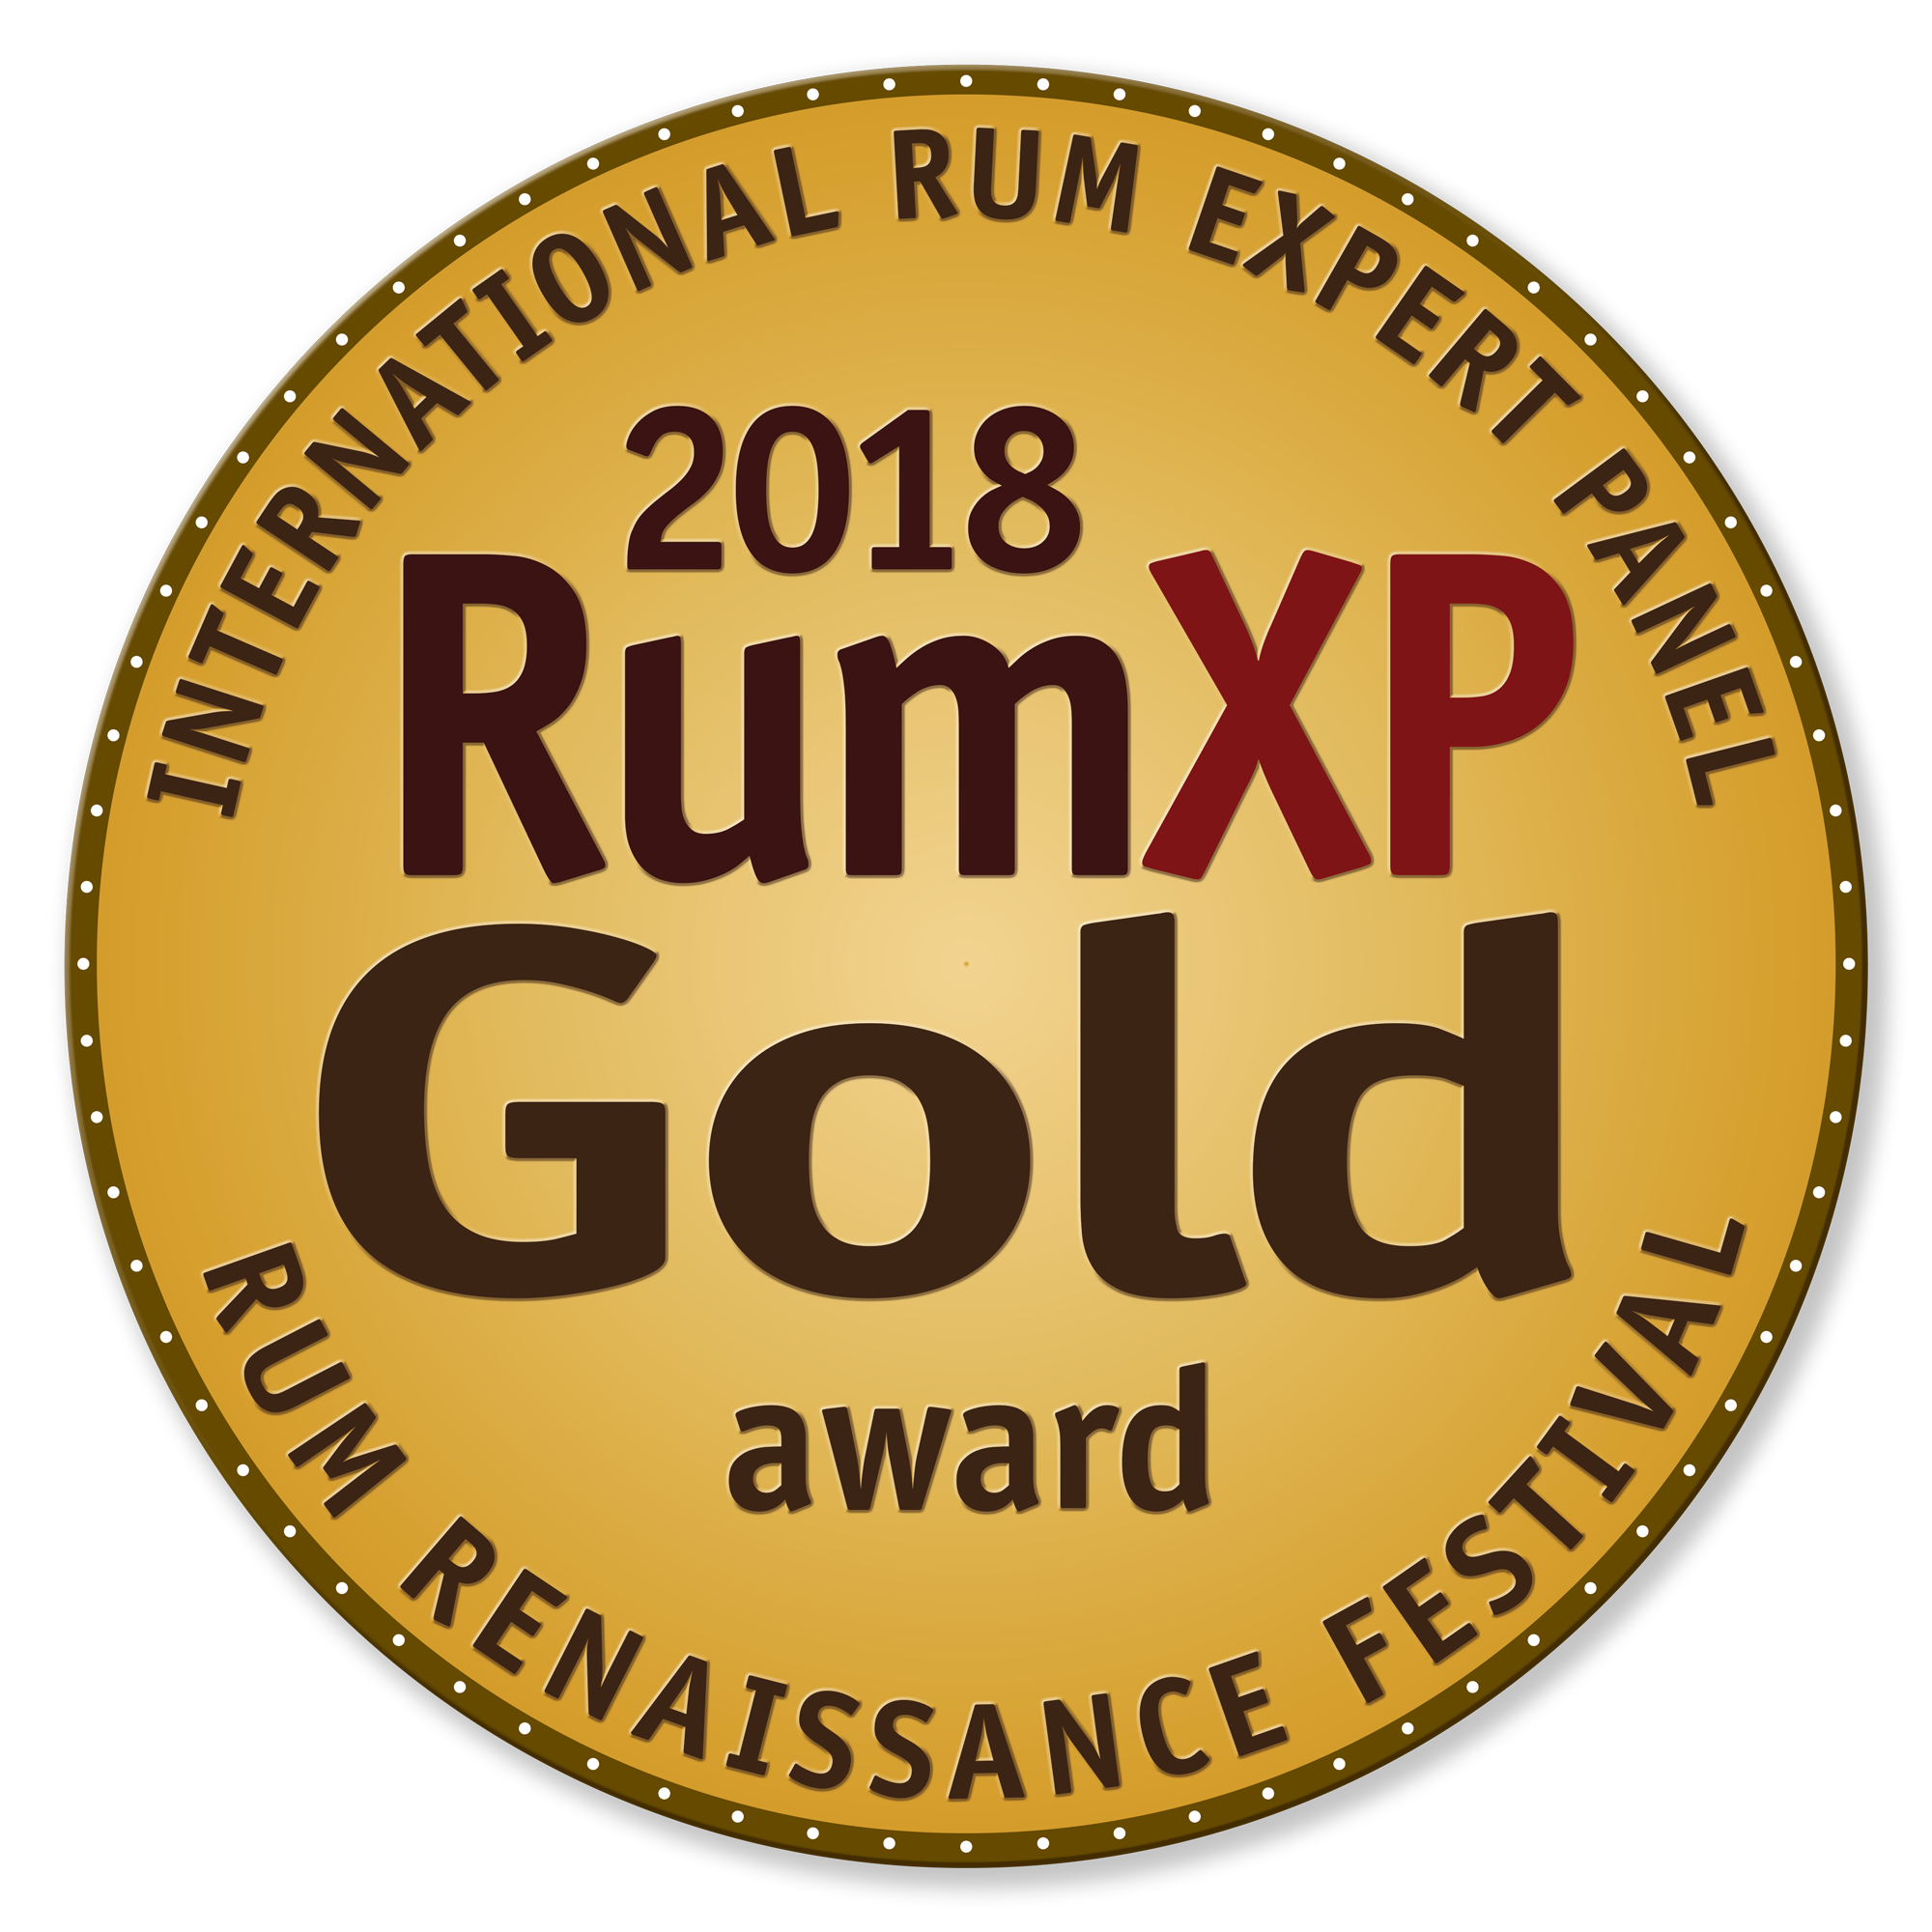 Peru 2004 : Rum XP Miami 2018, Gold Medal, US